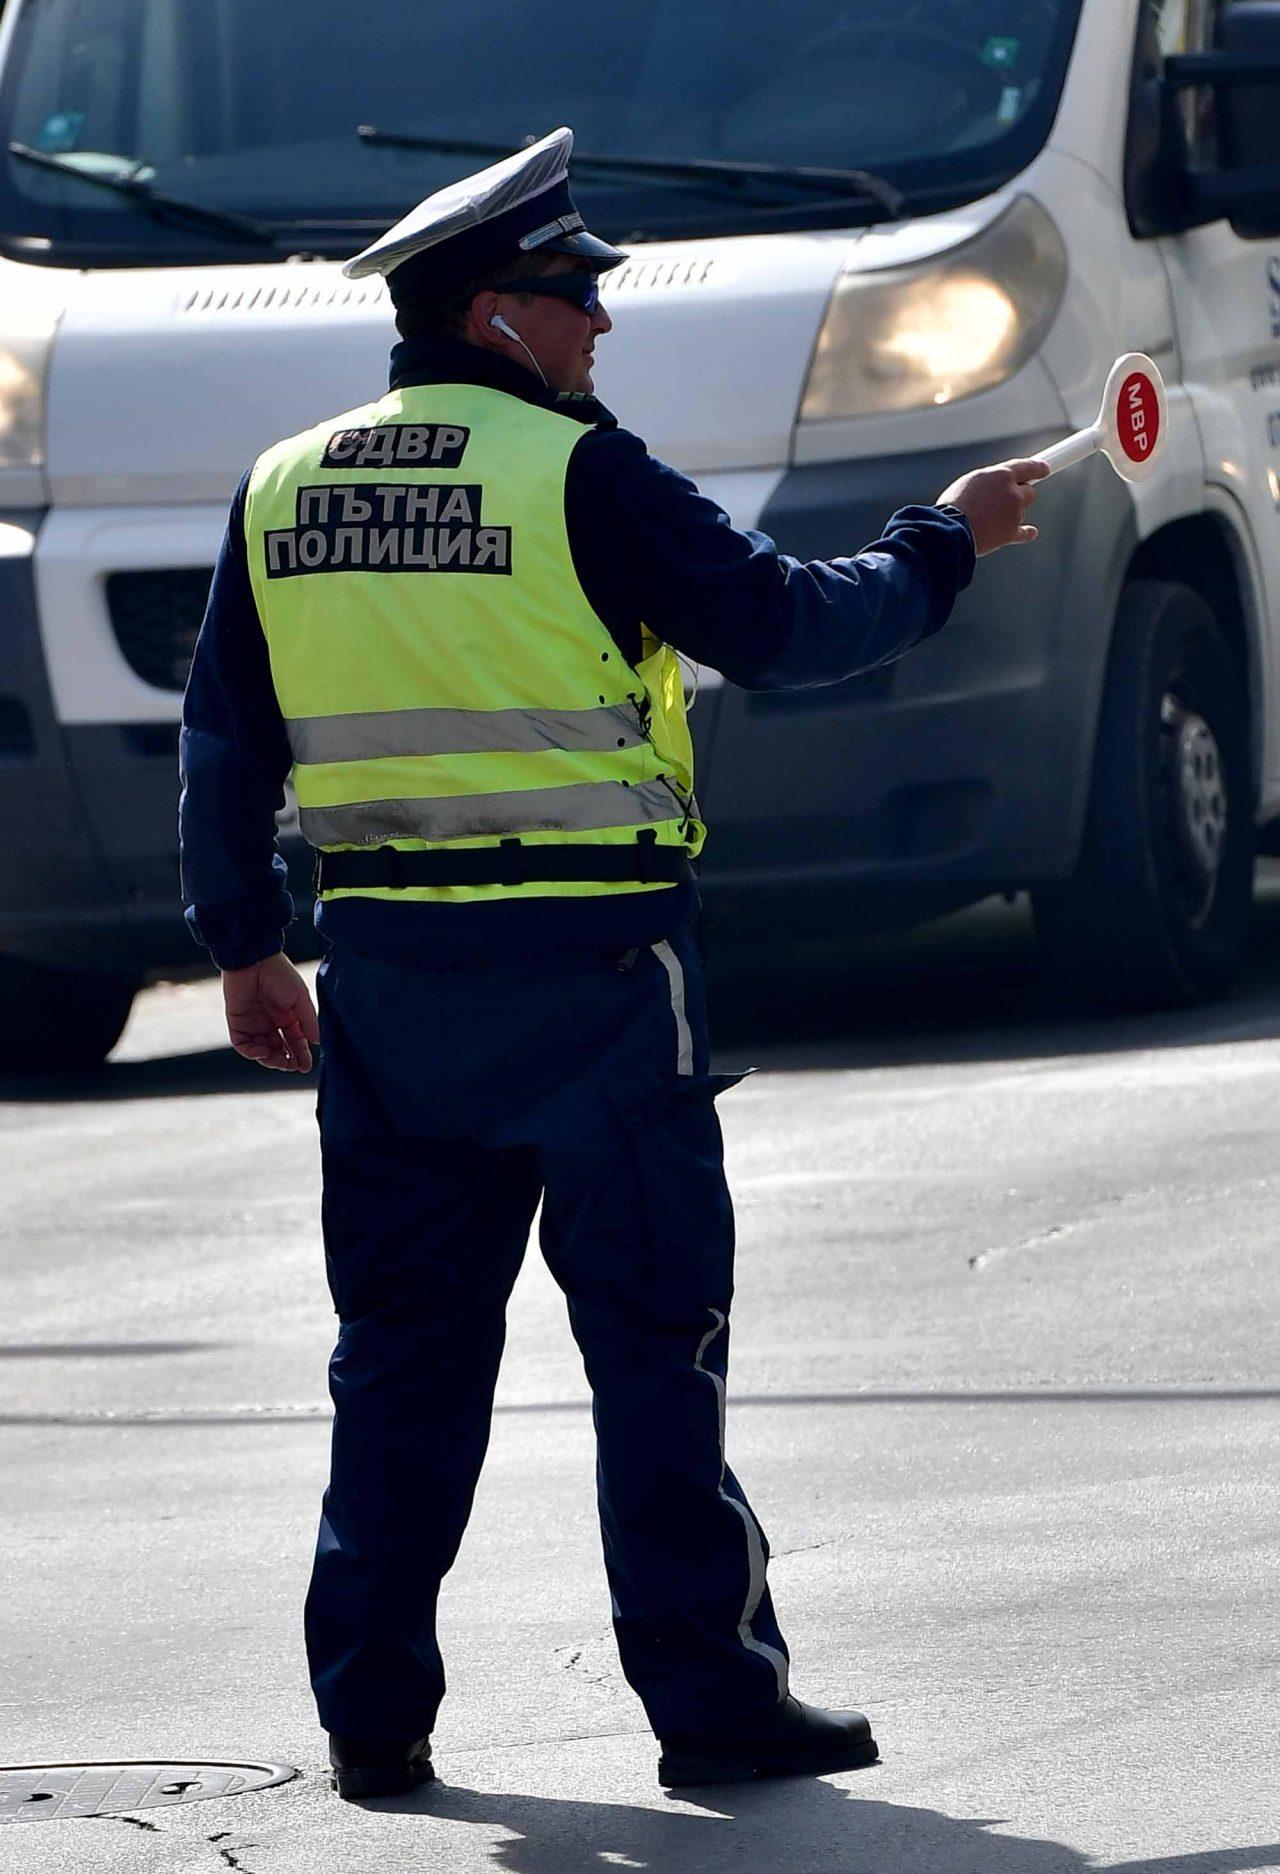 Пътна Полиция Пилицай Регулировчик (1)